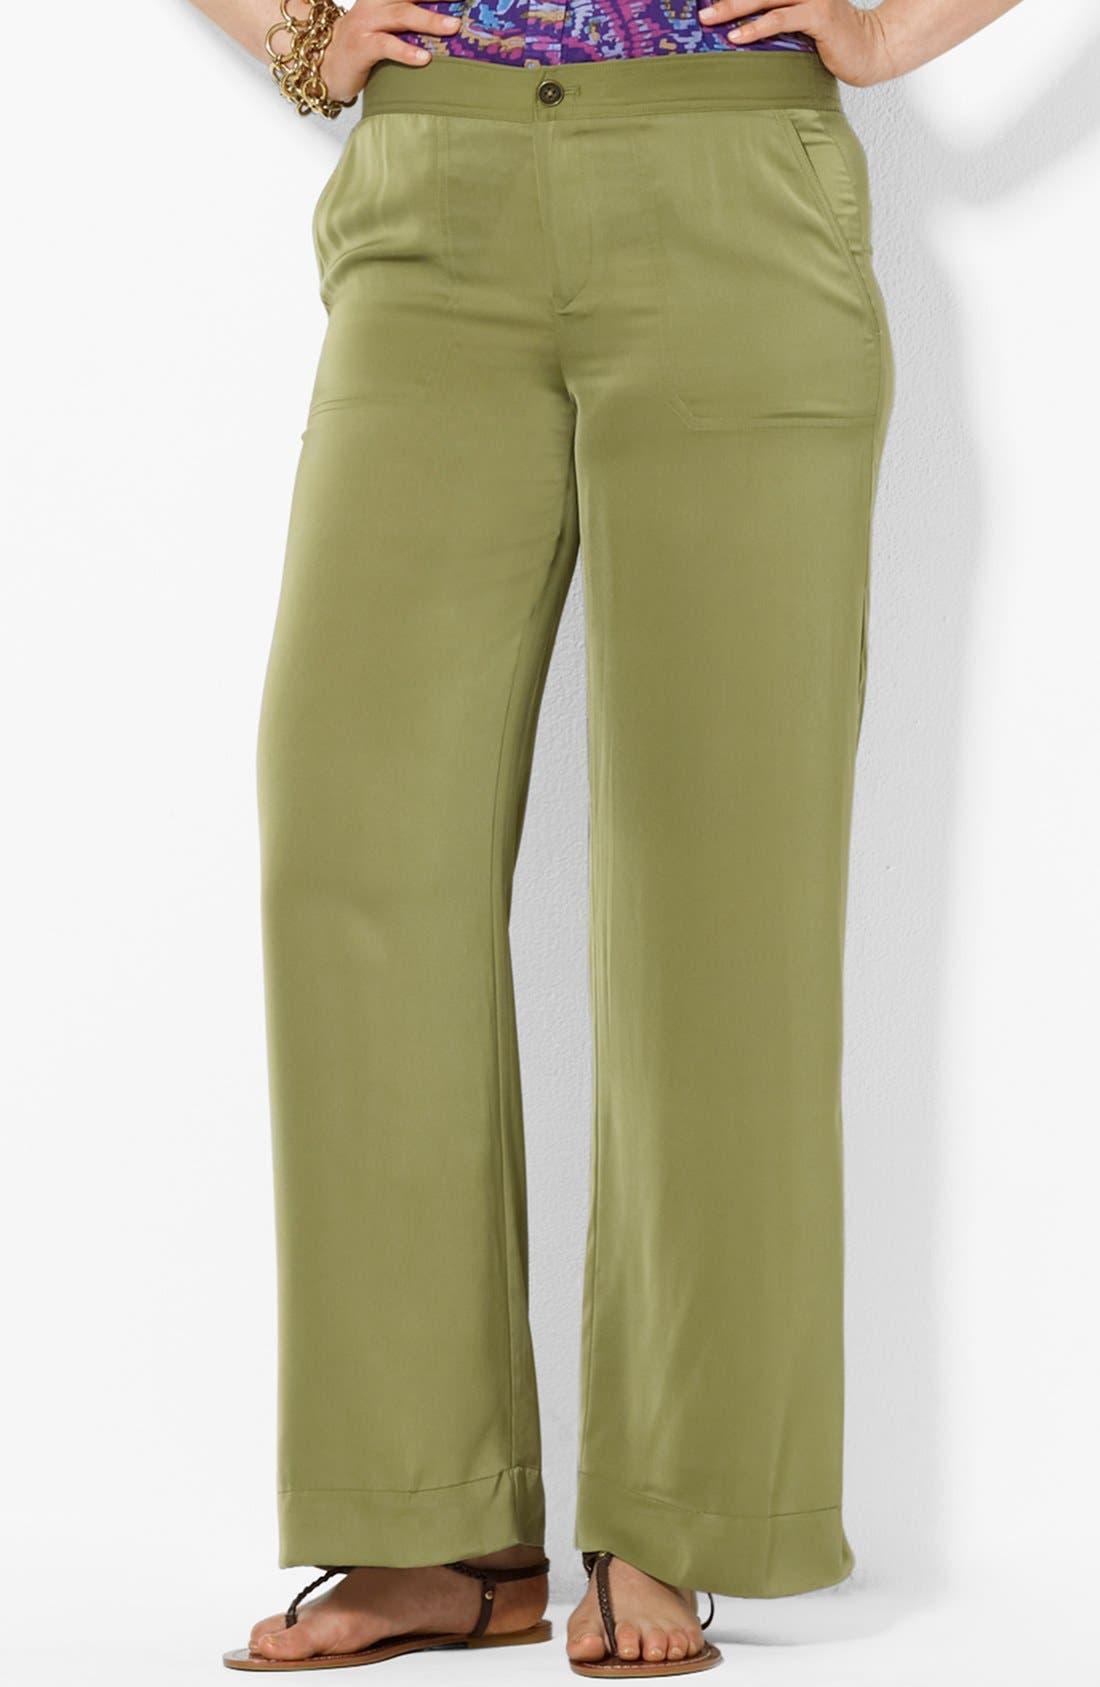 Alternate Image 1 Selected - Lauren Ralph Lauren Satin Pants (Plus Size)